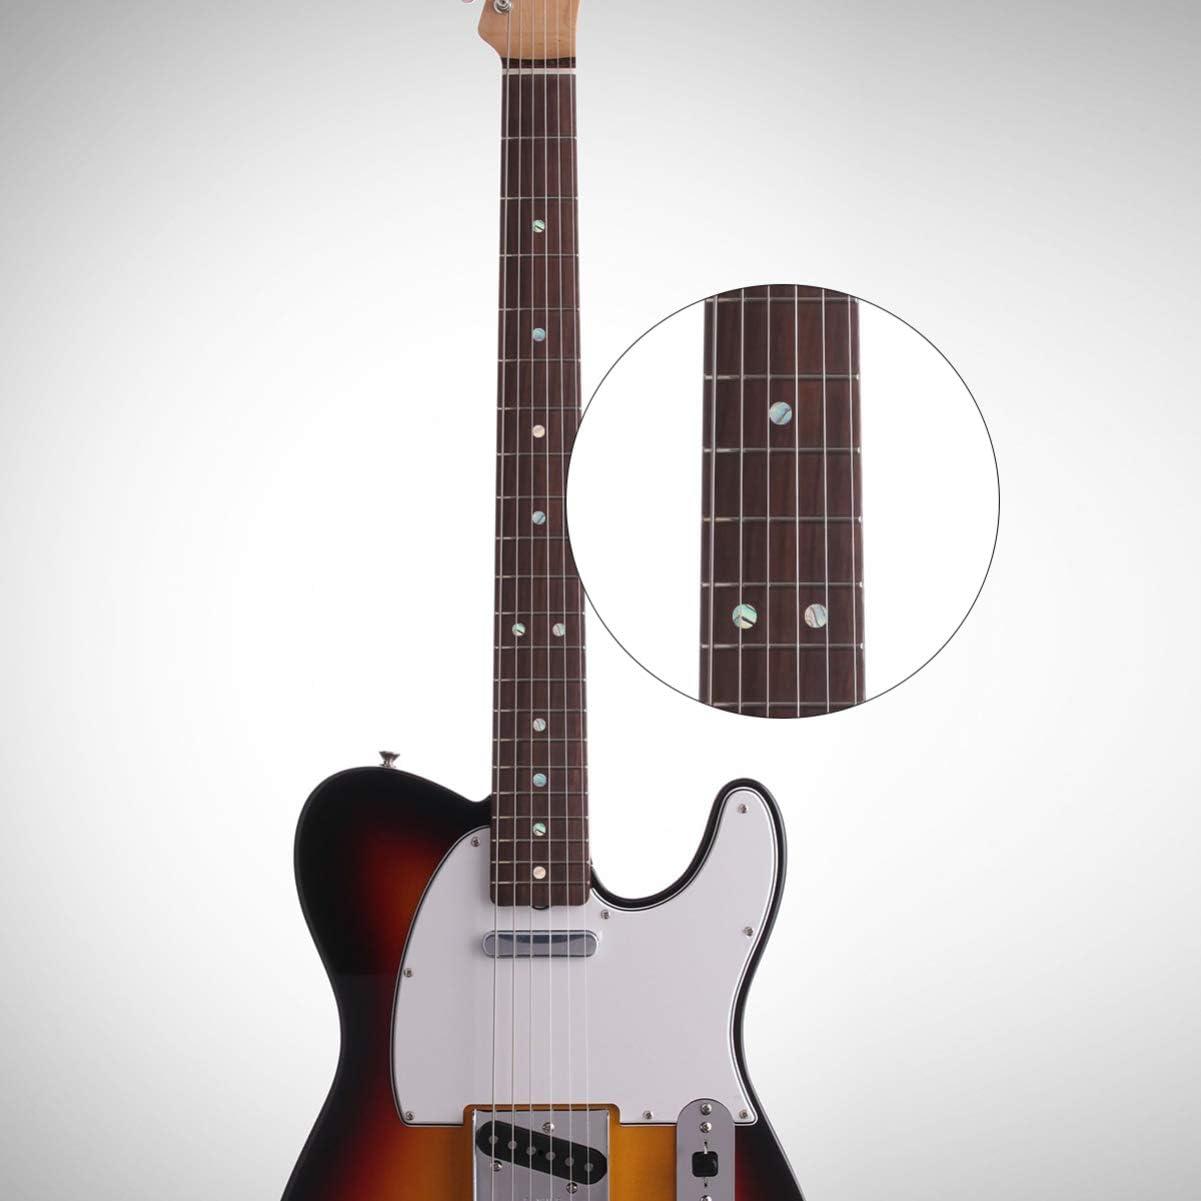 EXCEART 20 Piezas Diapas/ón Puntos Naturales Blanco N/ácar Concha Accesorios de Guitarra de Punto para Guitarra Bajo Ukelele Banjo